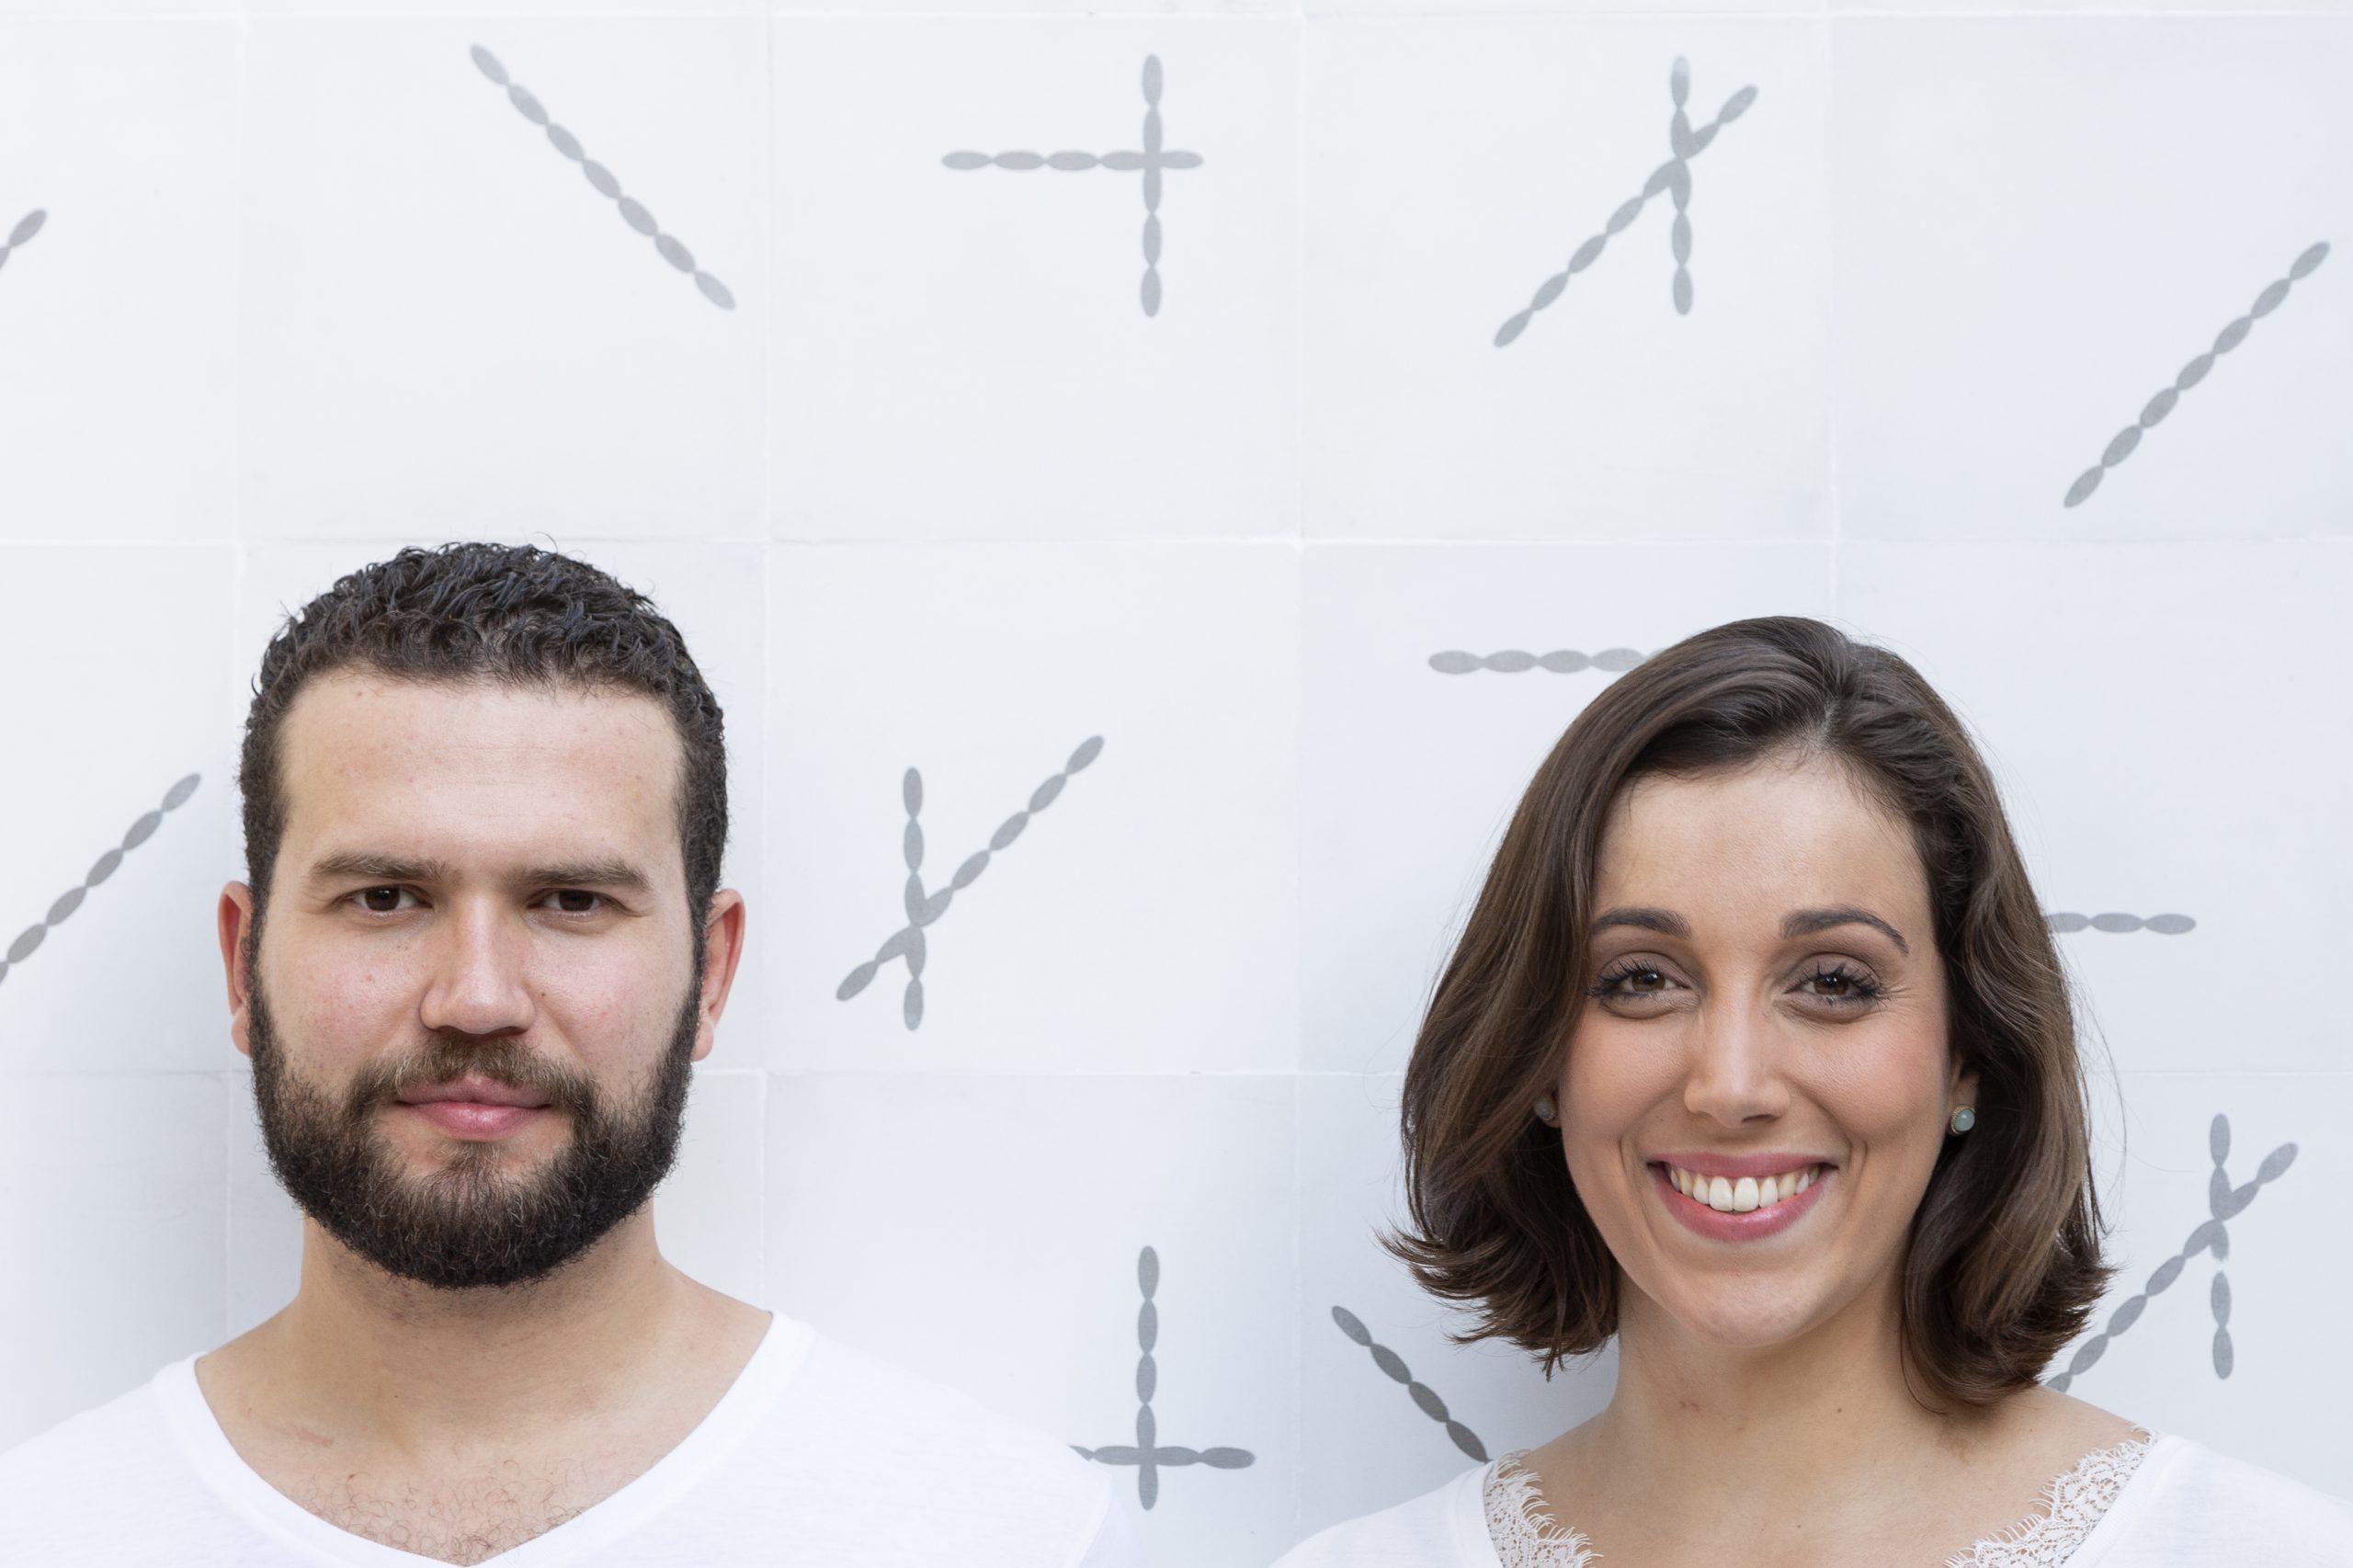 Felipe Stracci e Luciana Pitombo - Fundadores do Plantar Ideias